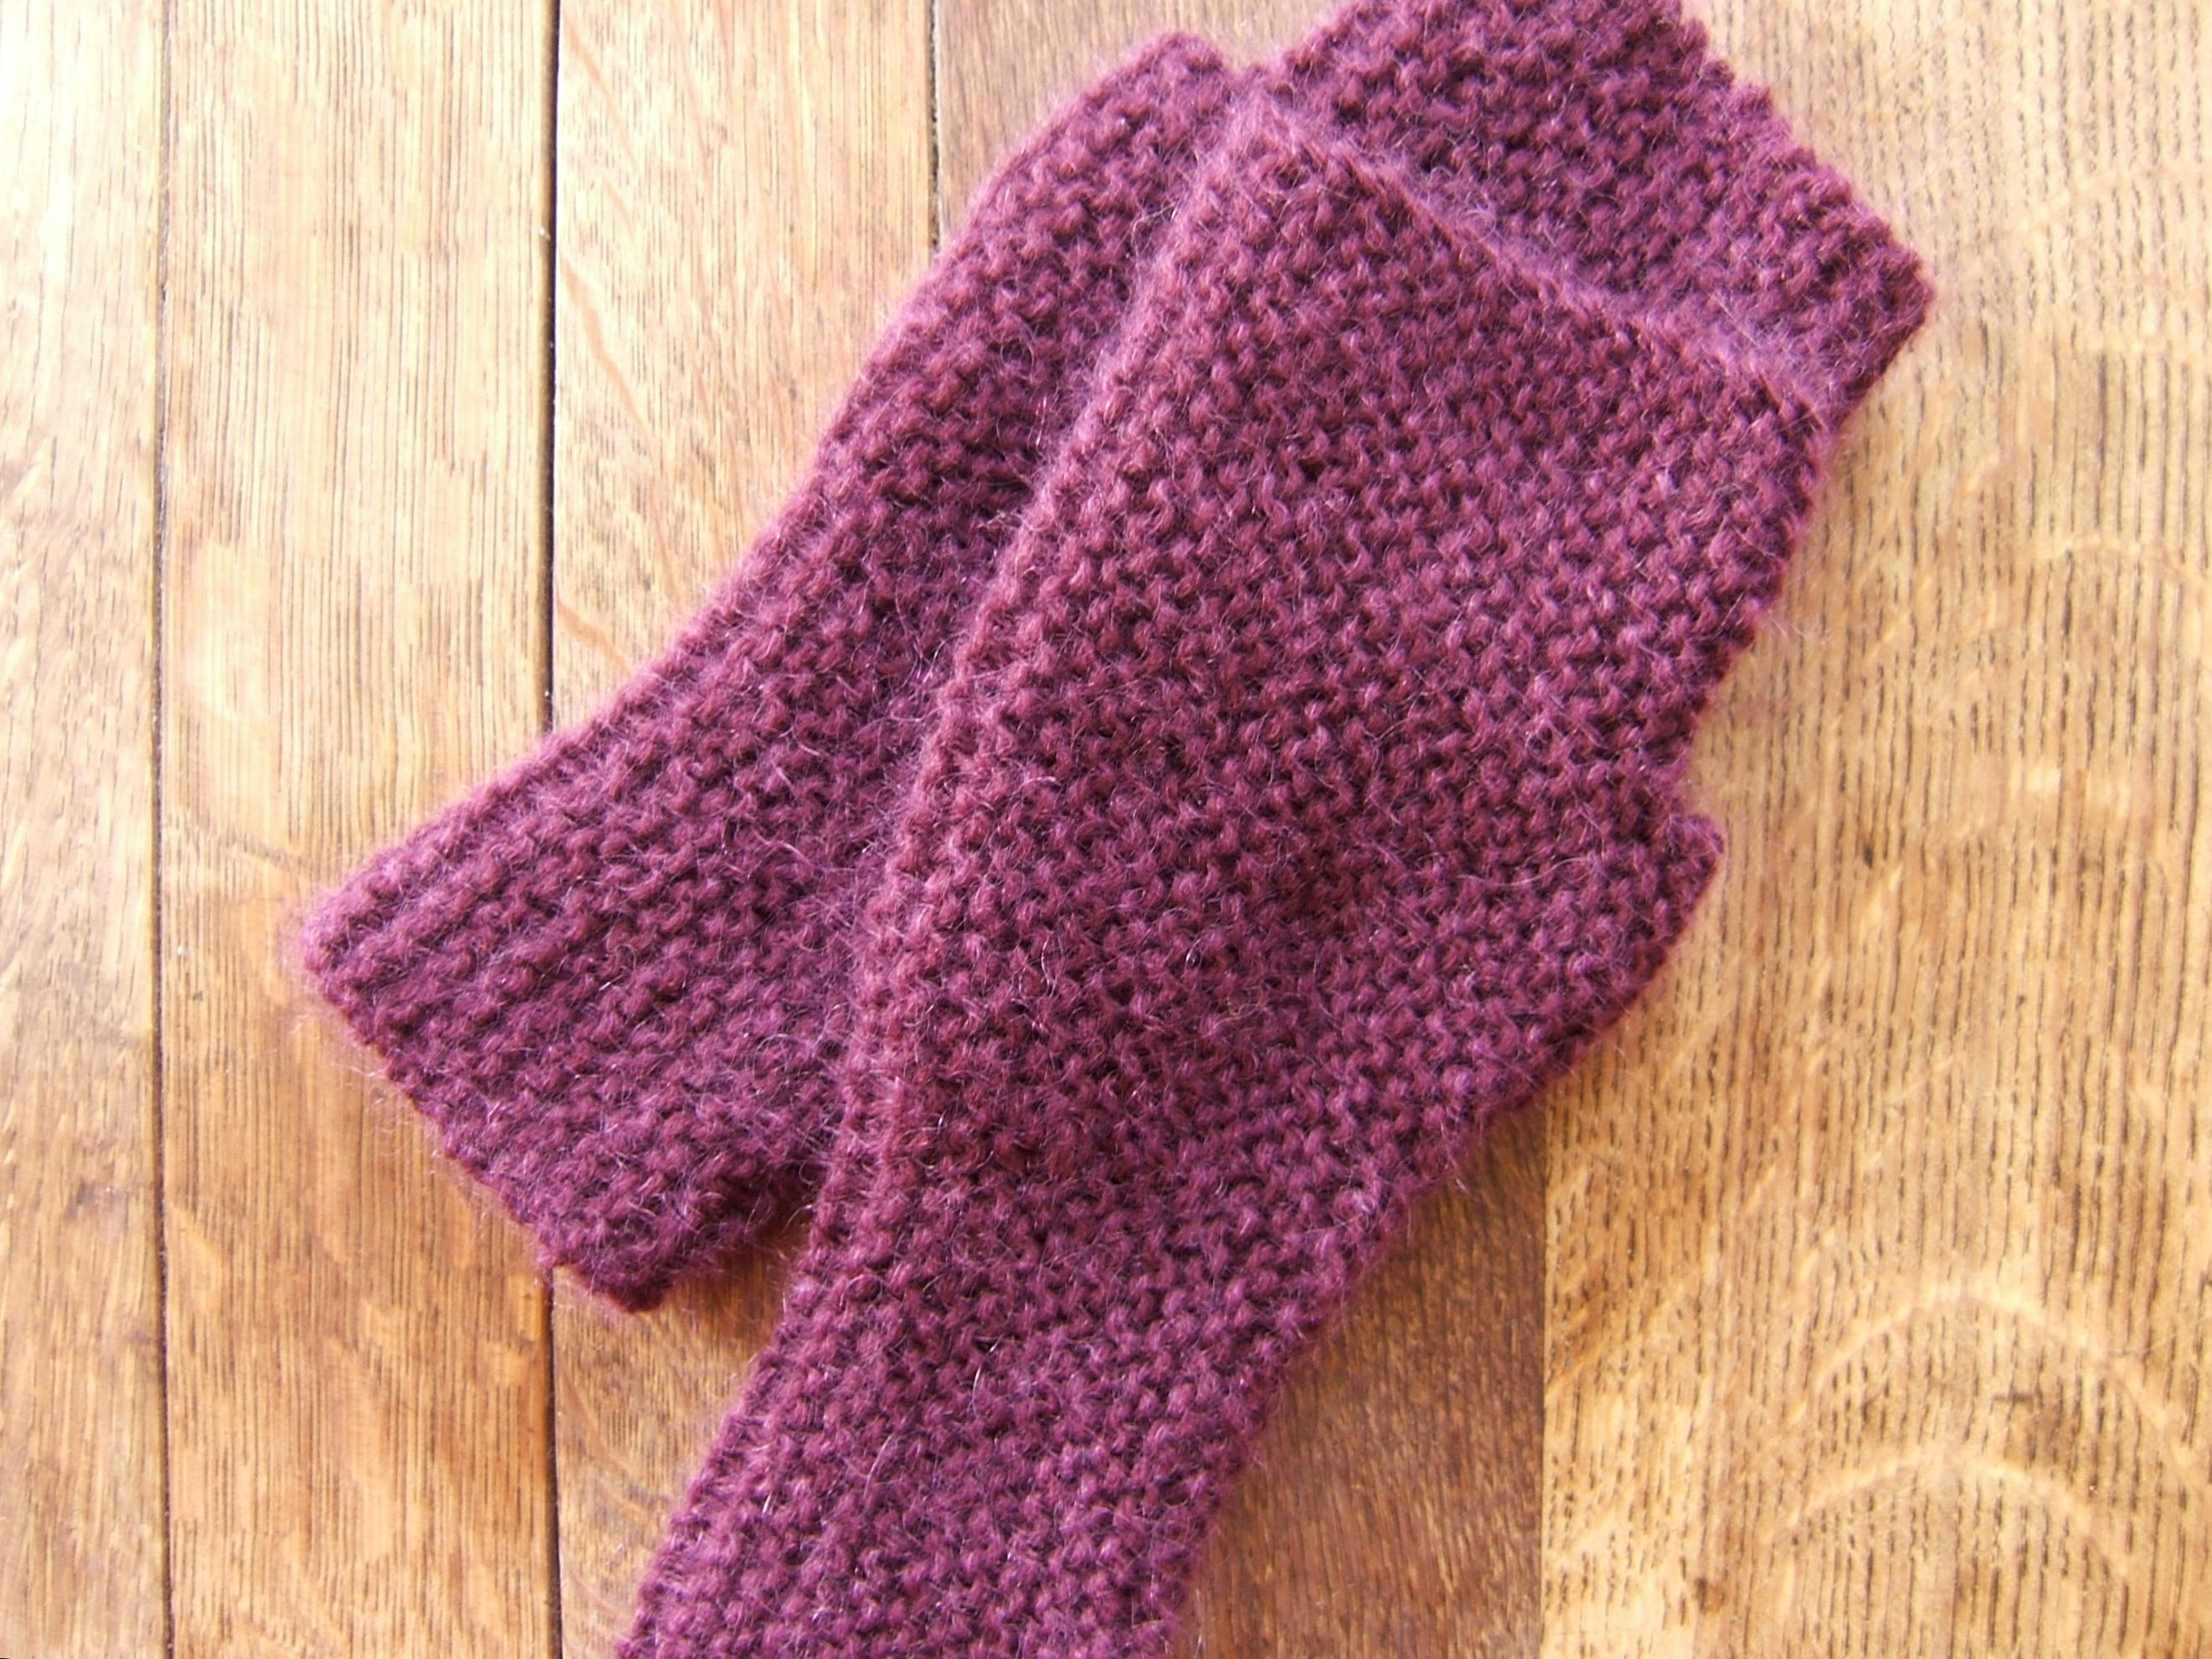 Knitting Lifeline Garter Stitch : Free garter stitch knitting patterns